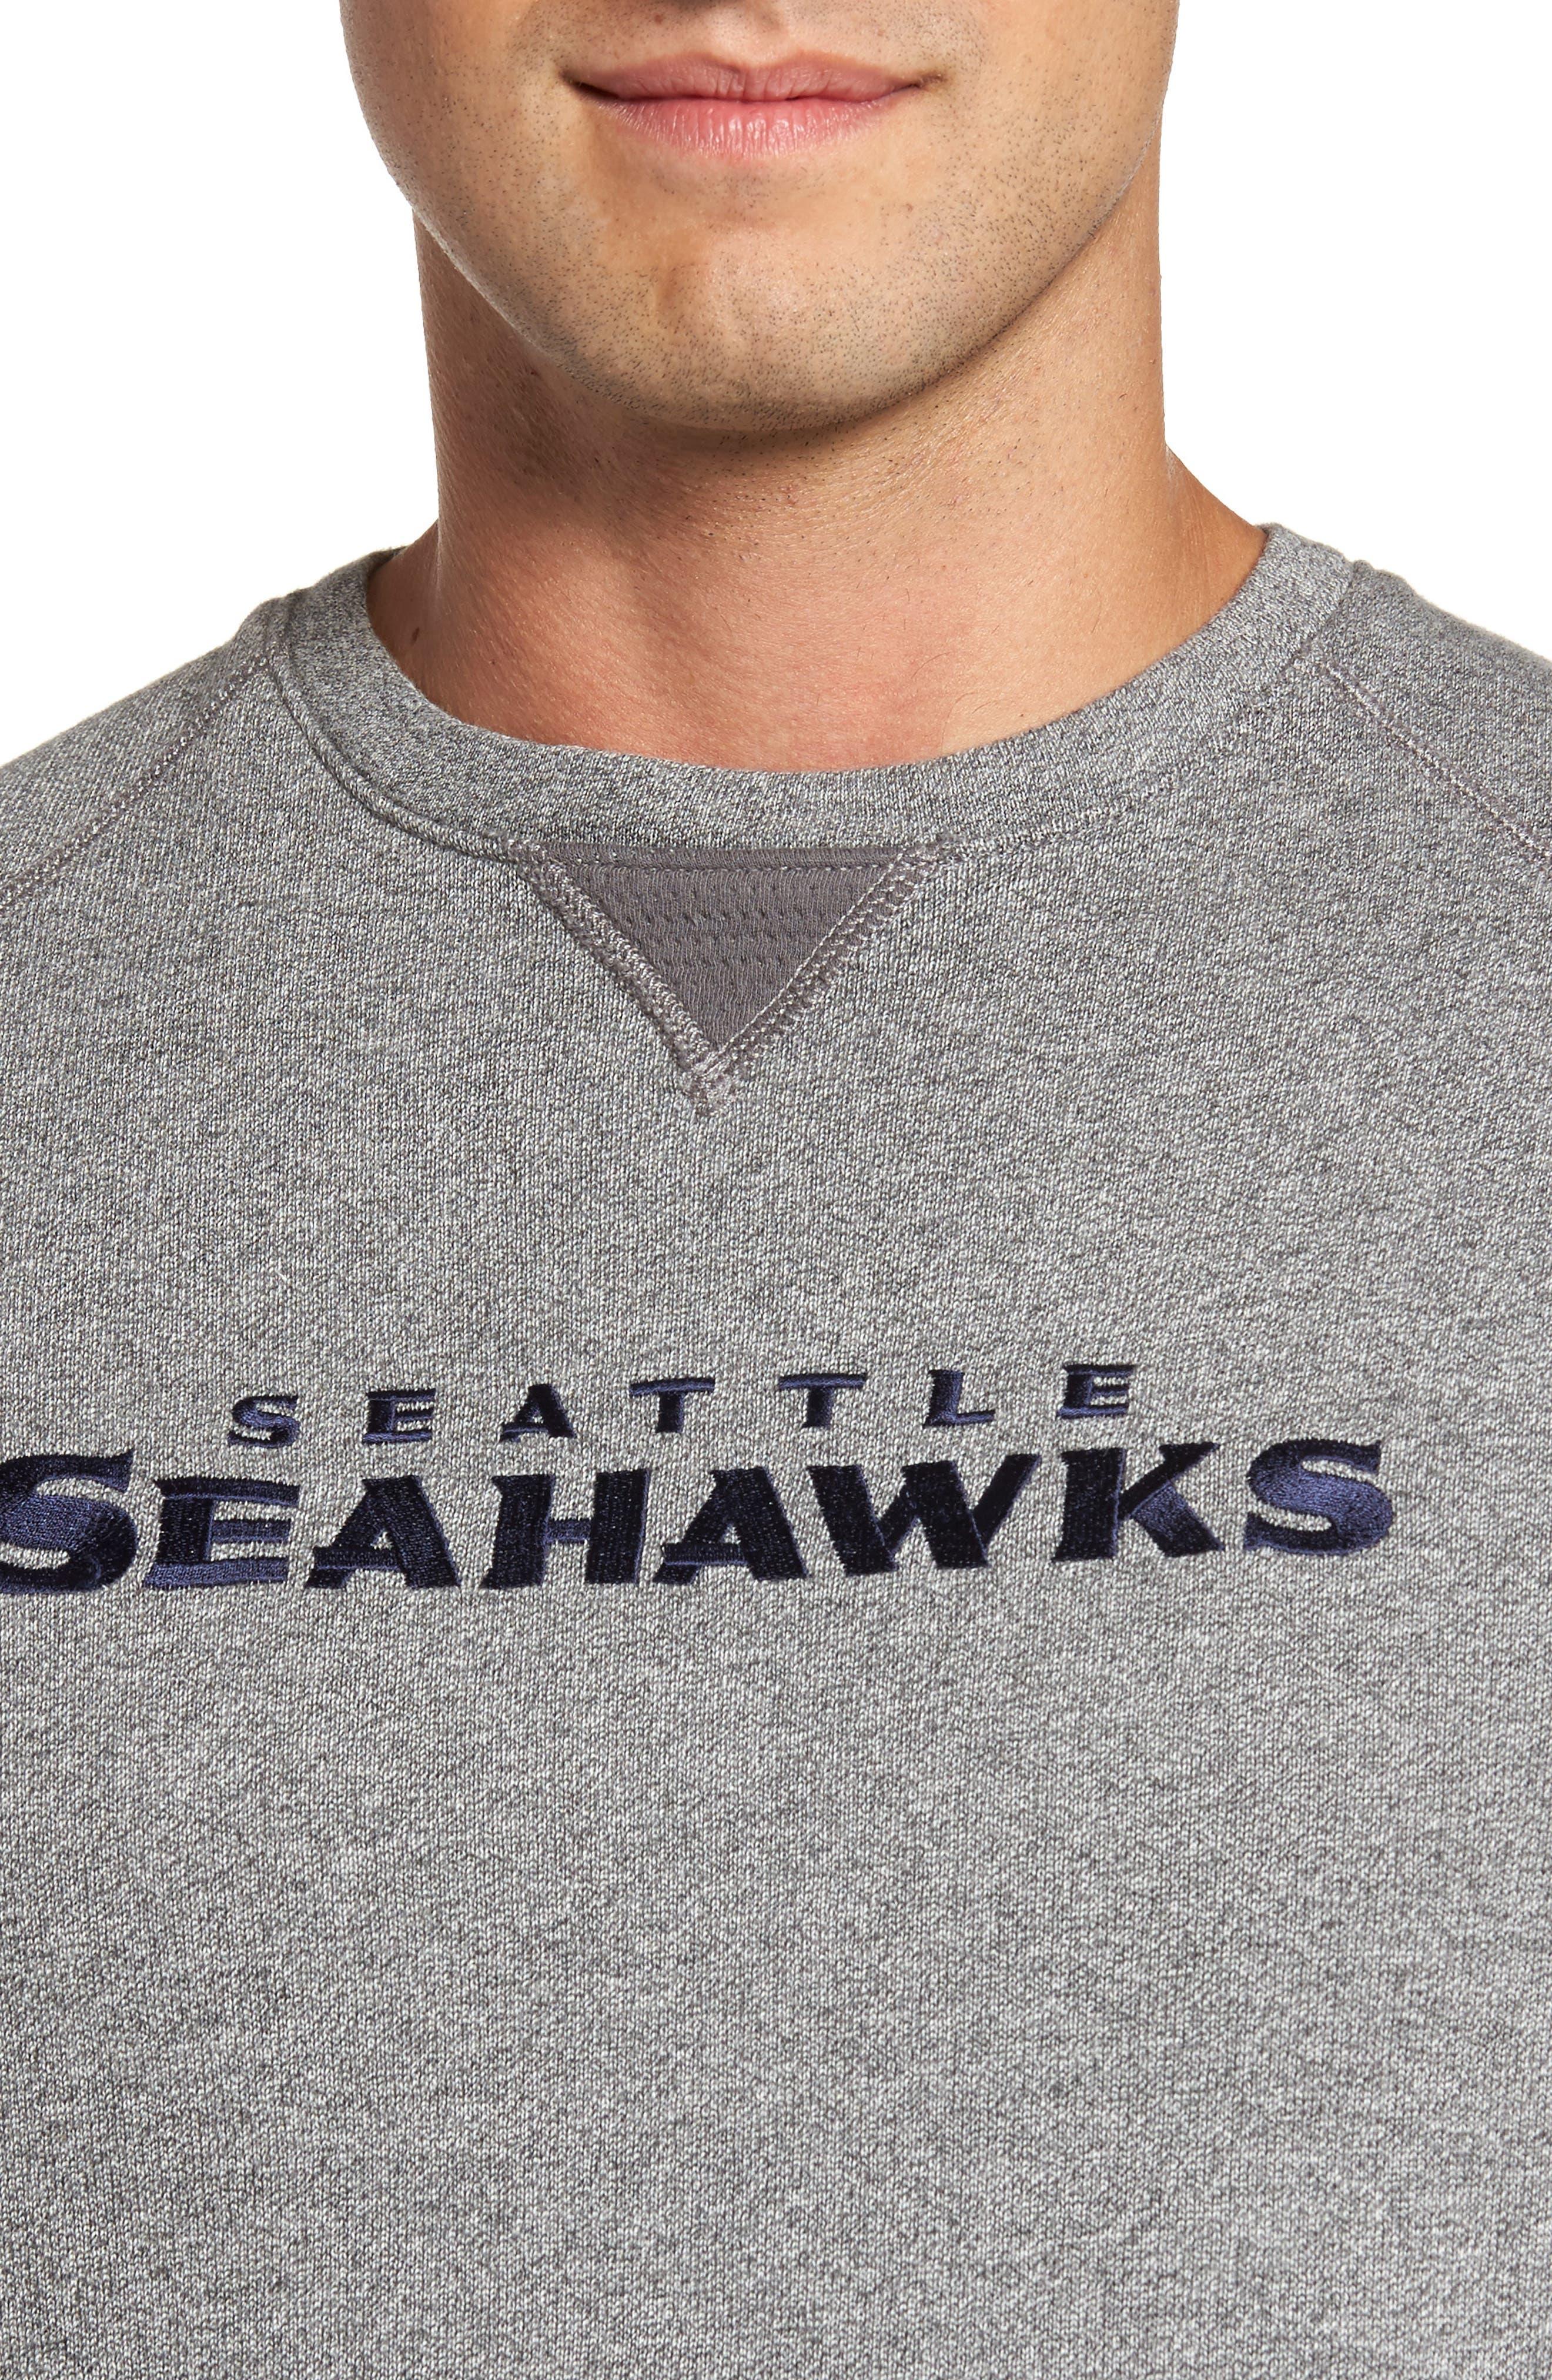 NFL Stitch of Liberty Embroidered Crewneck Sweatshirt,                             Alternate thumbnail 118, color,